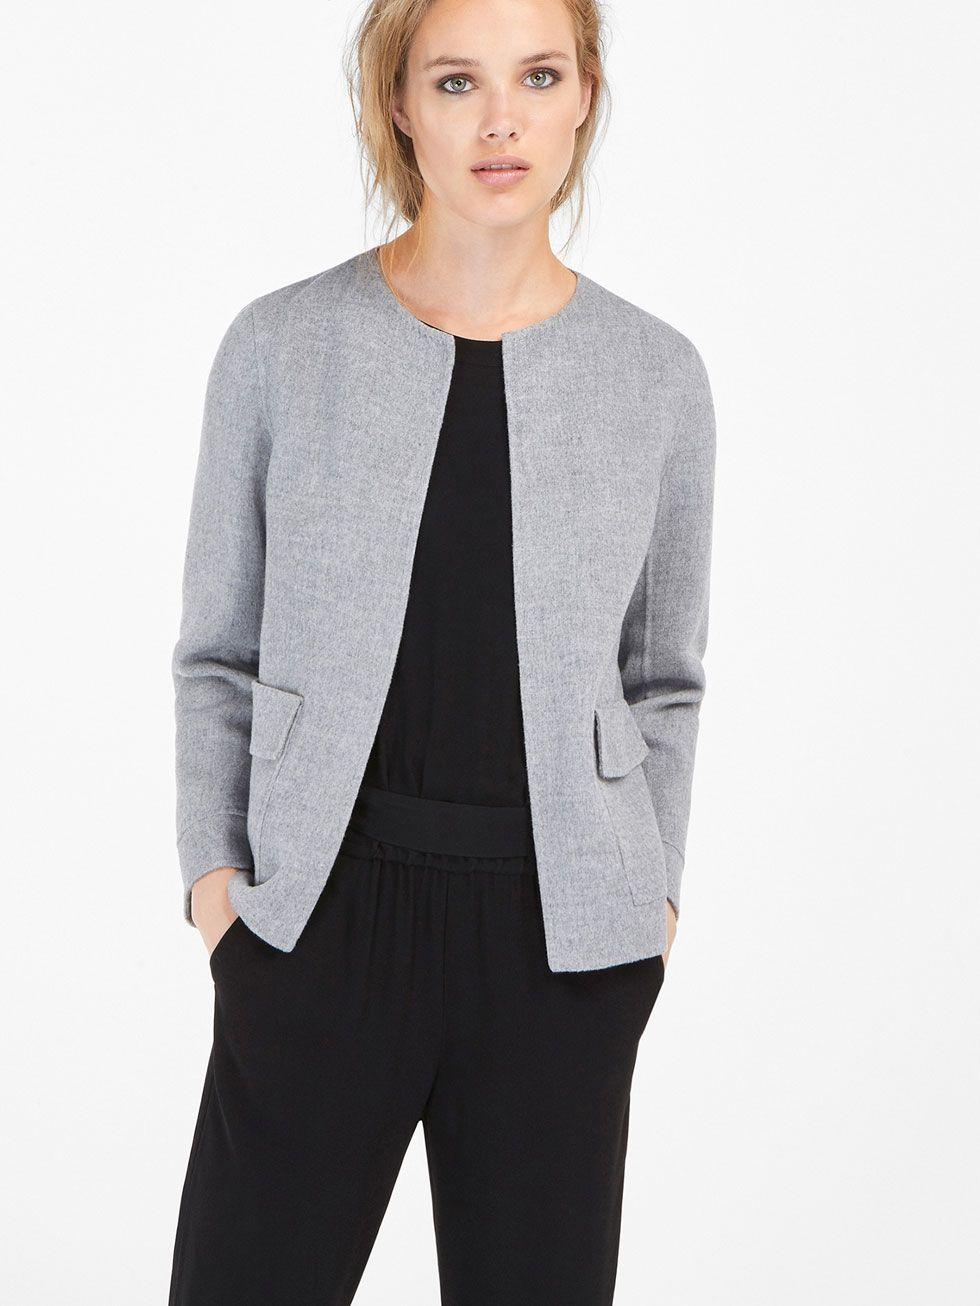 Kurzjacke Grau | Jacken, Kurze jacken und Jacken damen